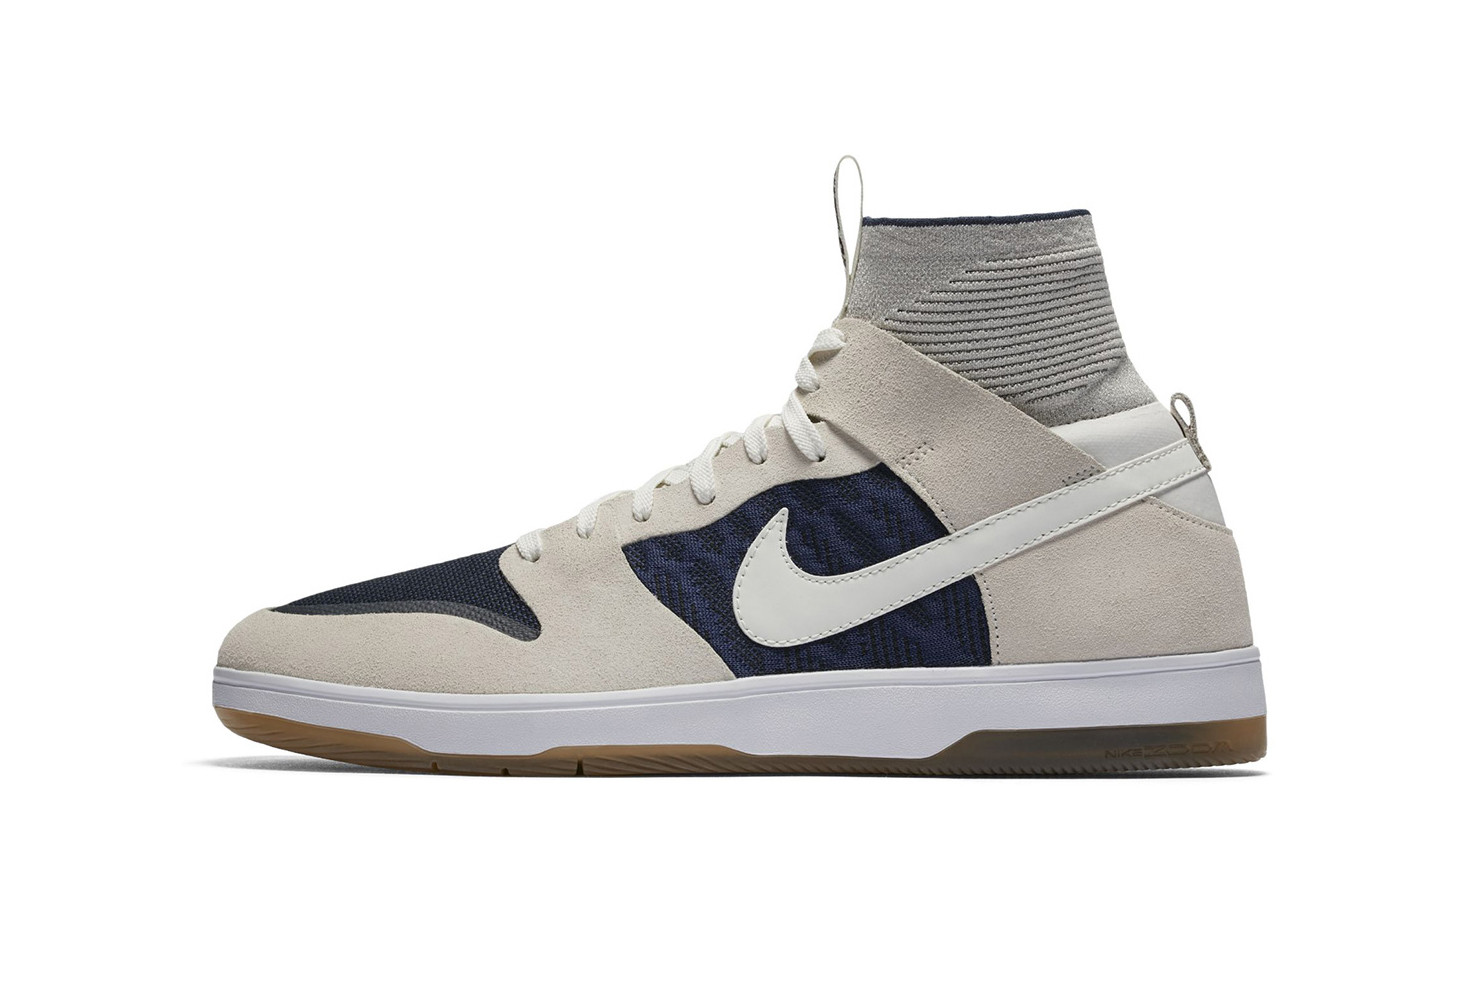 Nike SB Dunk High Elite in Off-White